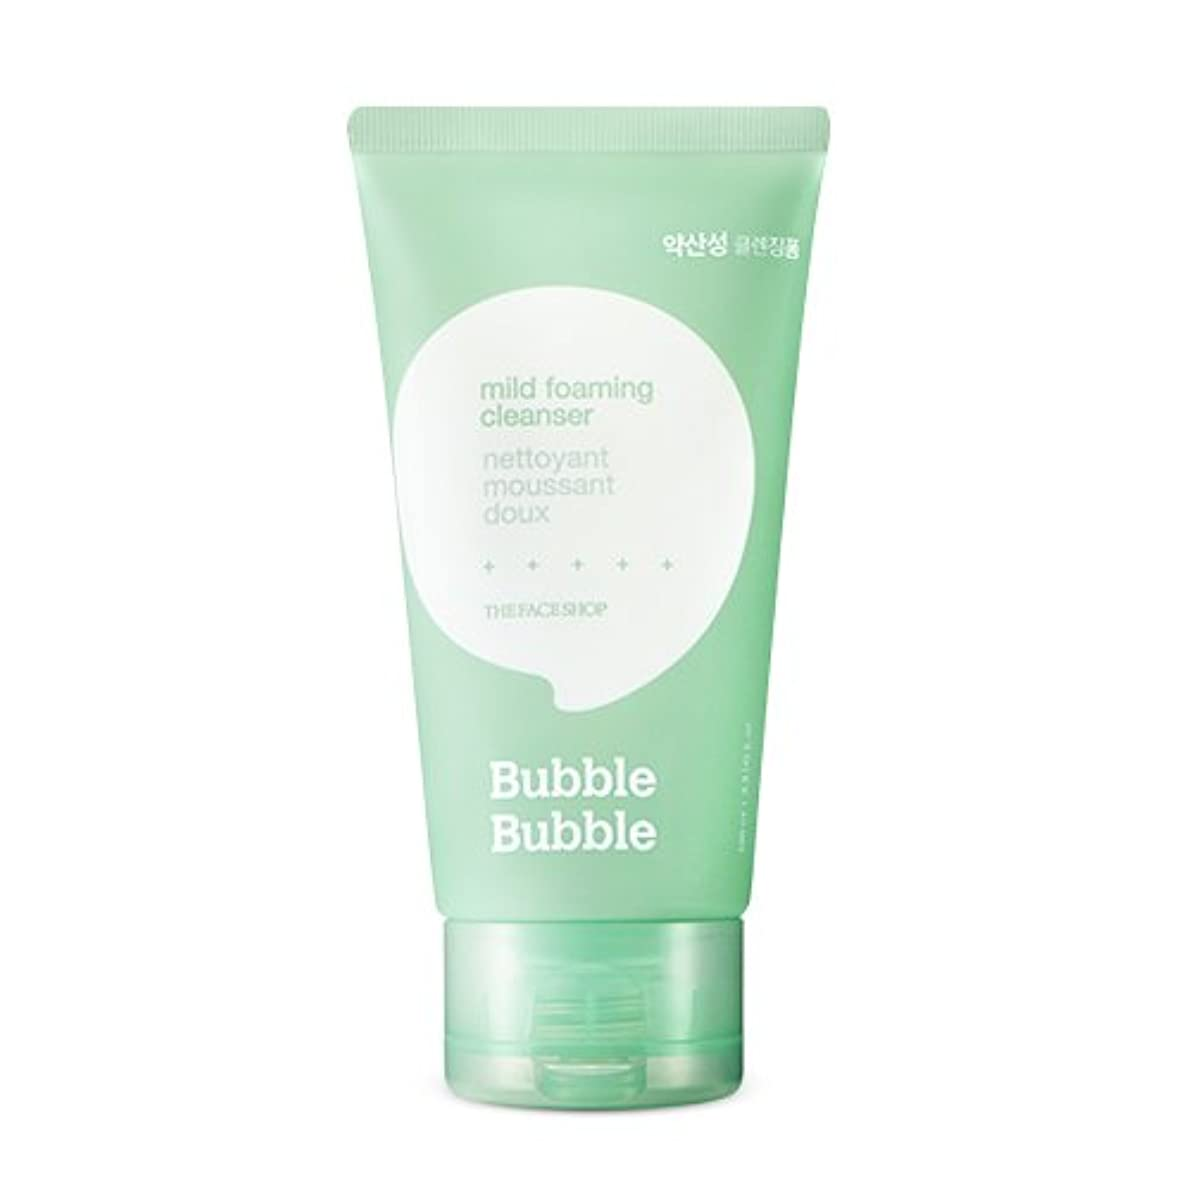 THE FACE SHOP Bubble Bubble Foaming cleanser (2.Mild) / ザ?フェイスショップバブルバブルクレンジングフォーム [並行輸入品]